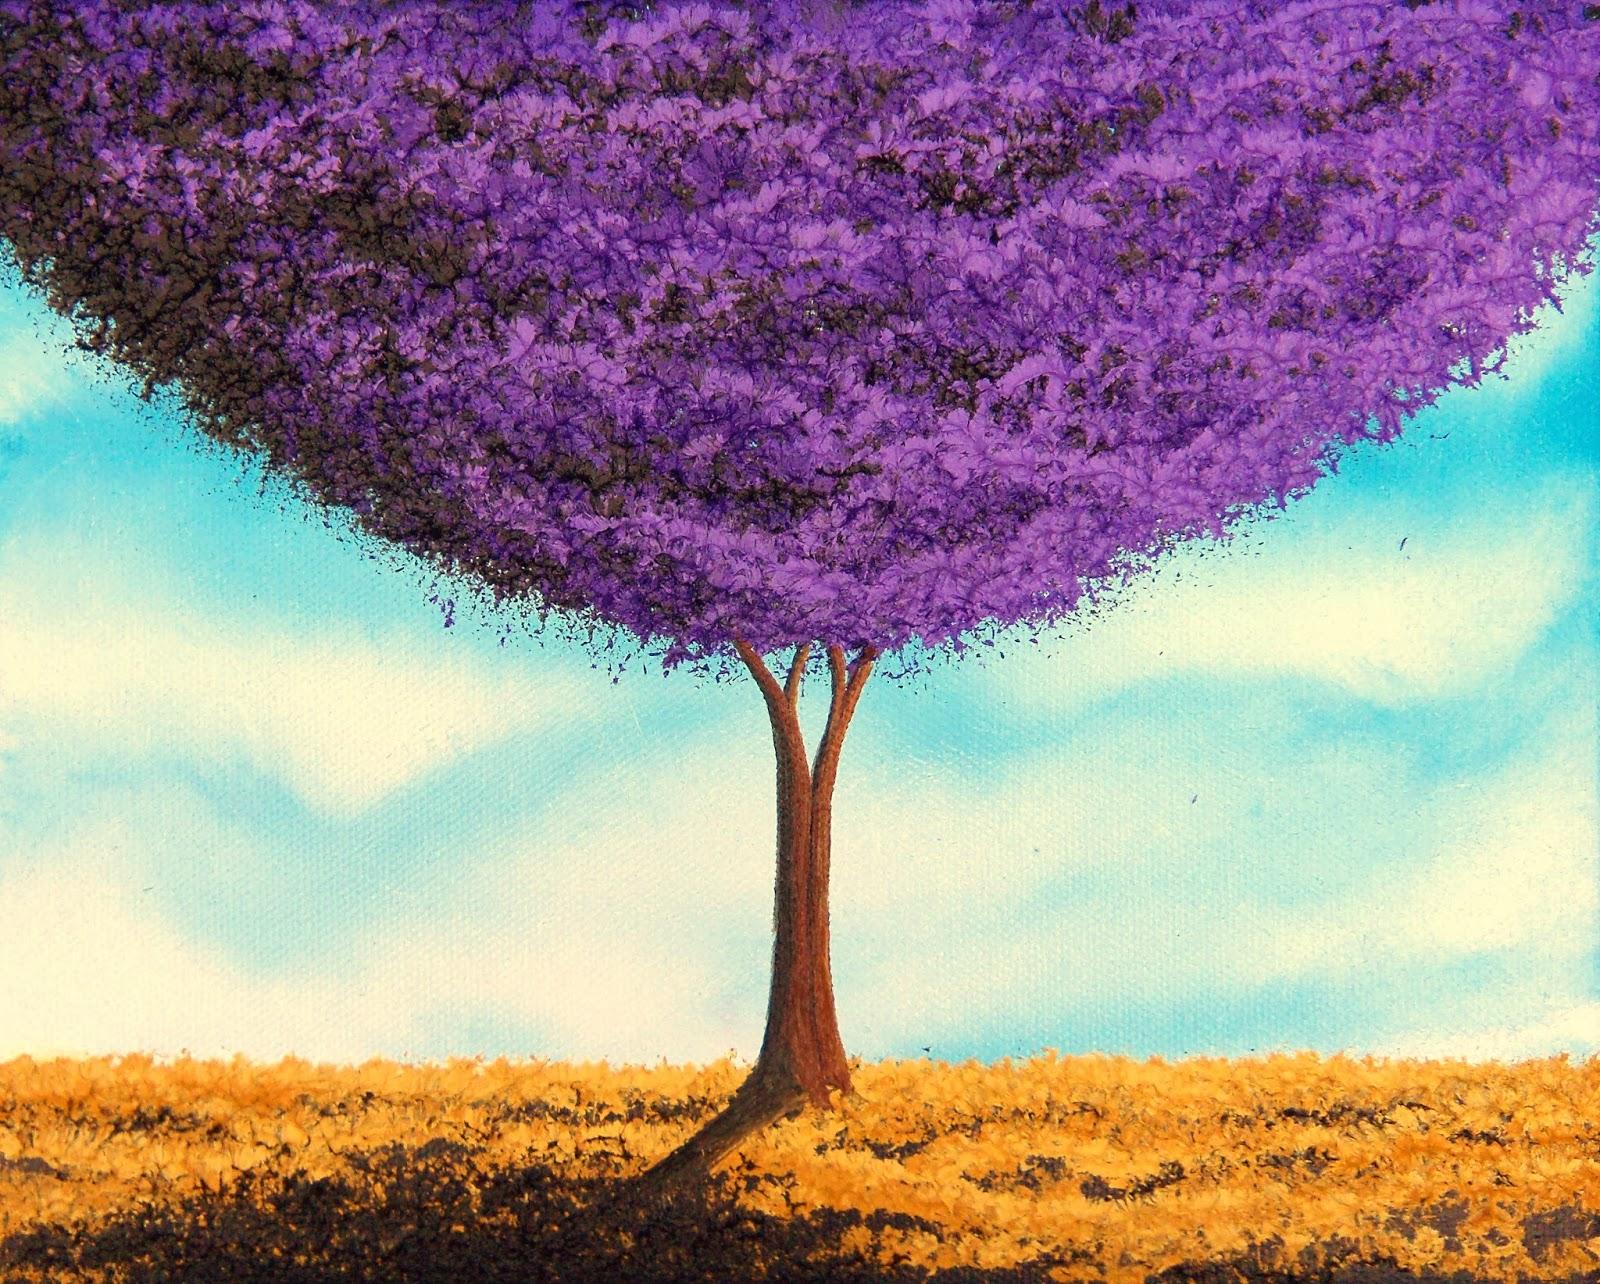 contemporary art paintings of trees 8 x 10 original oil